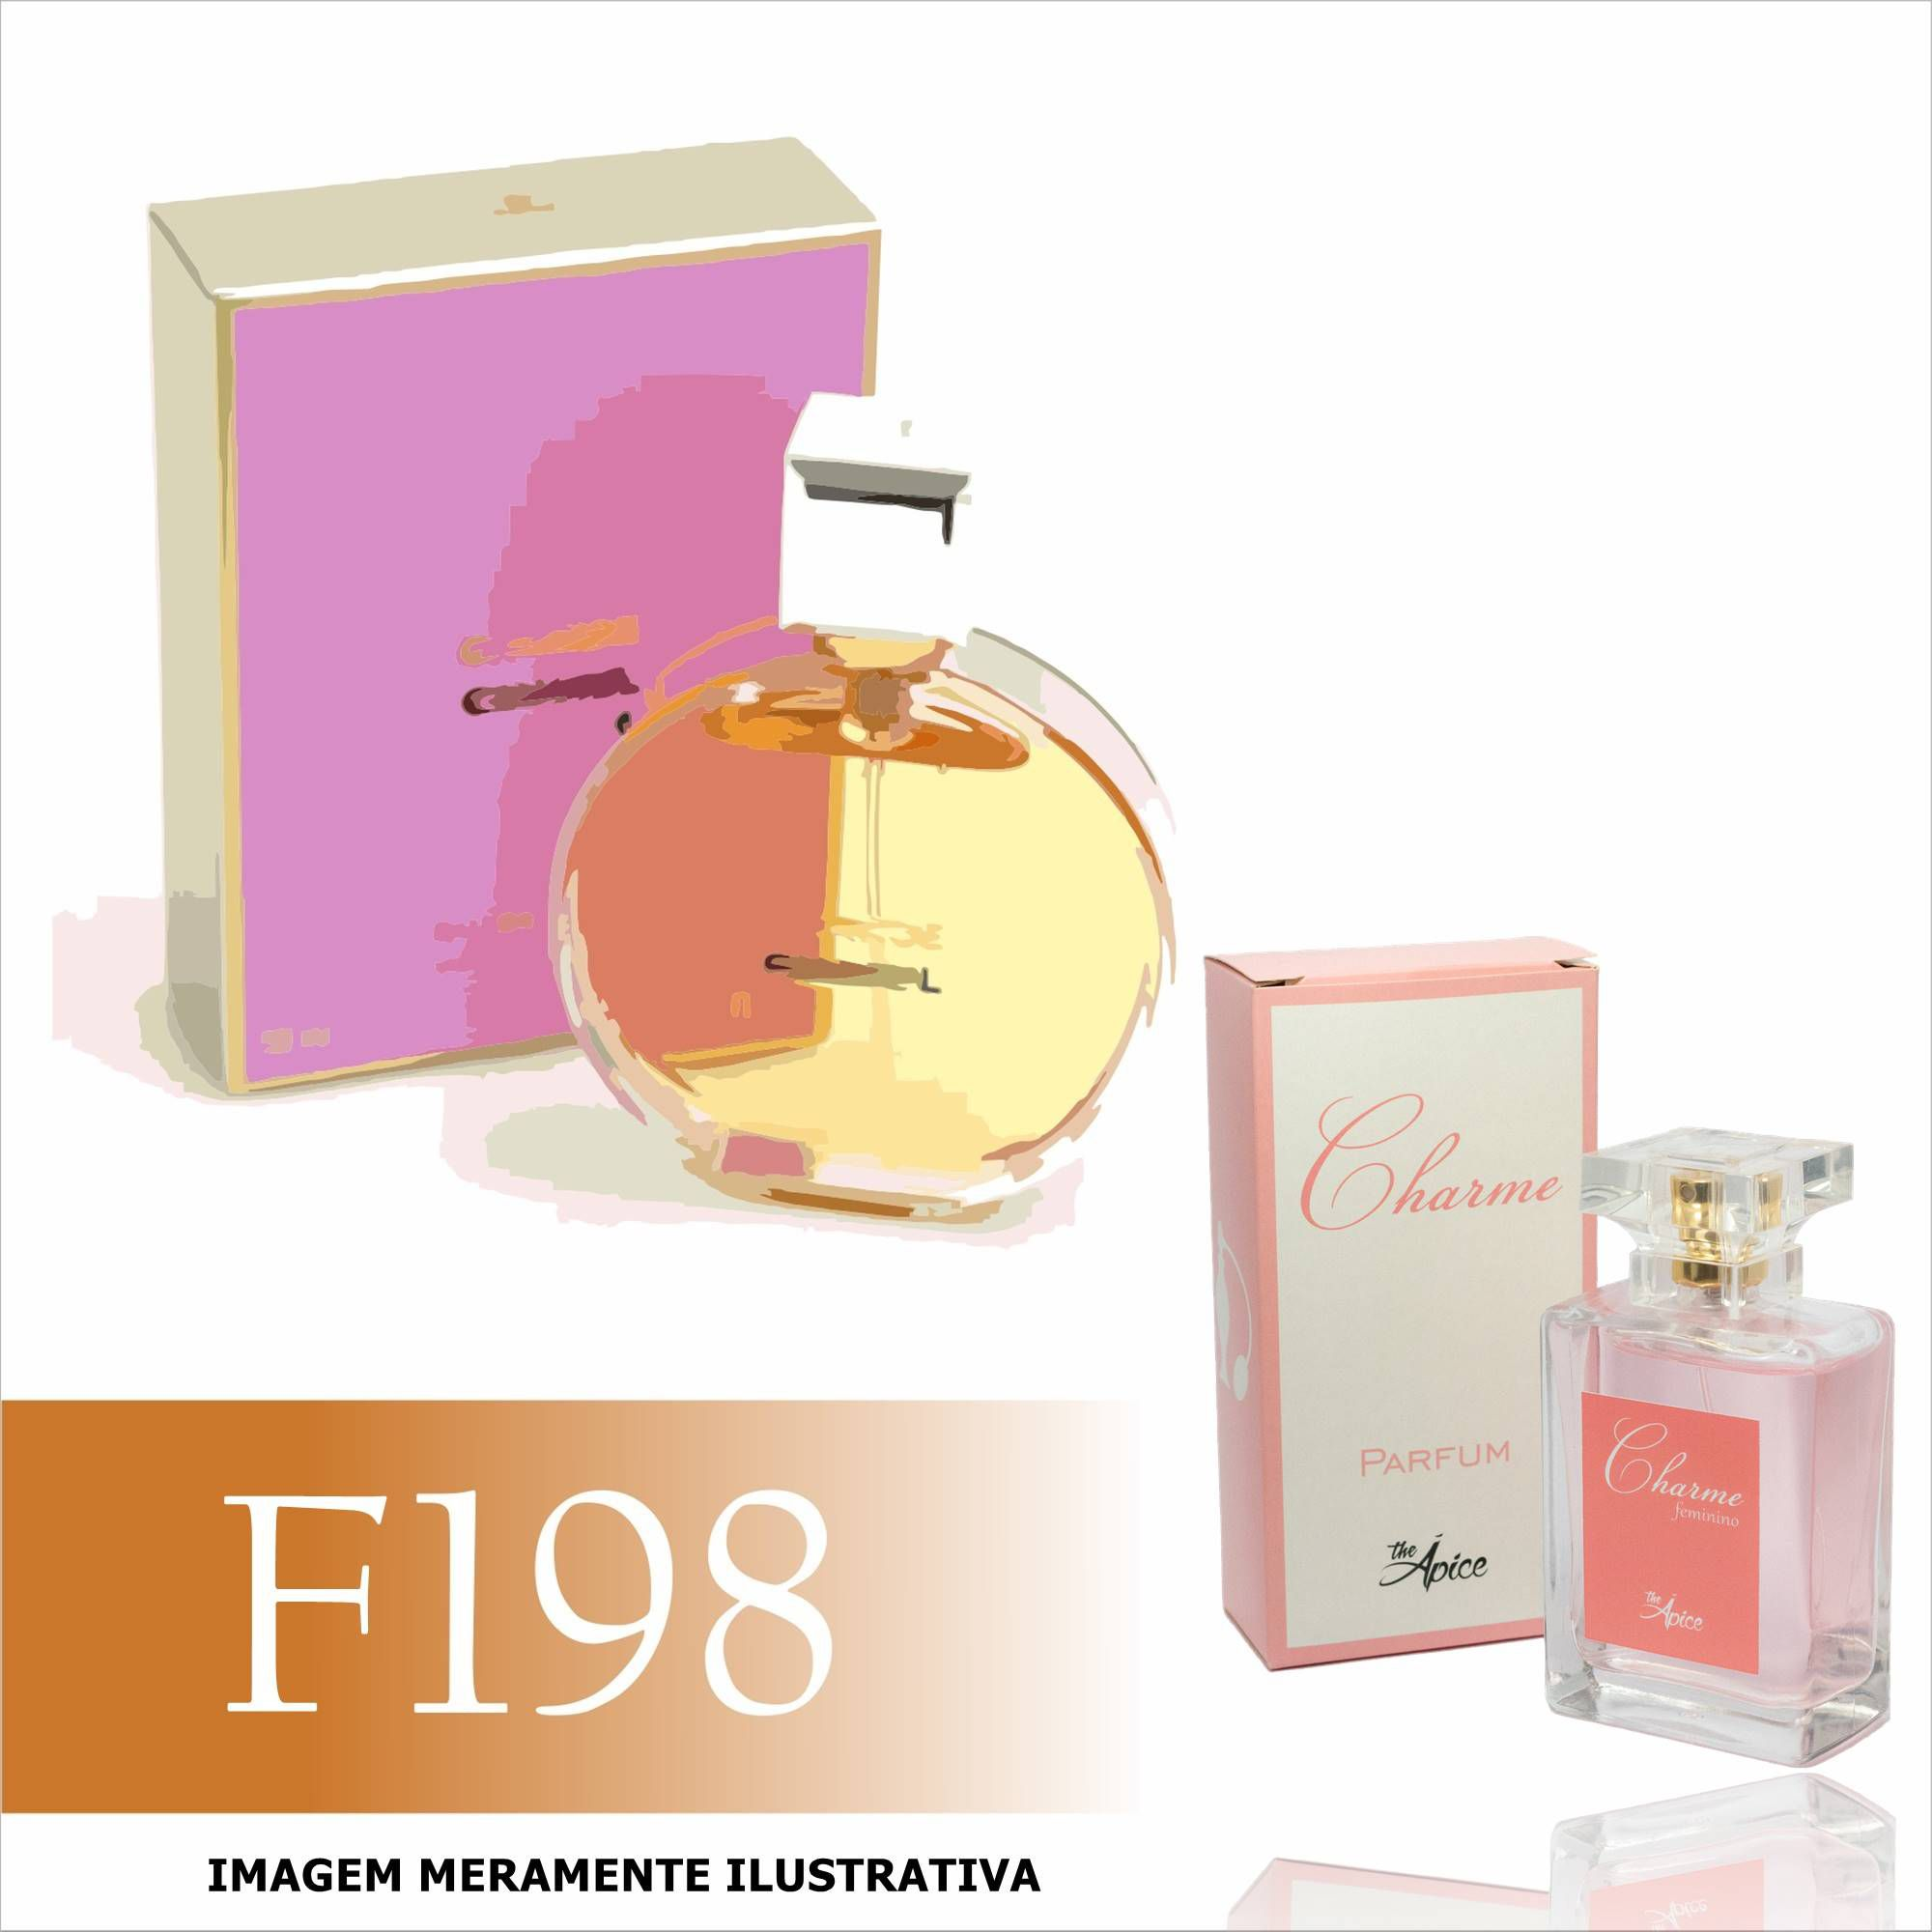 Perfume F198 Inspirado no Chance da Chanel Feminino